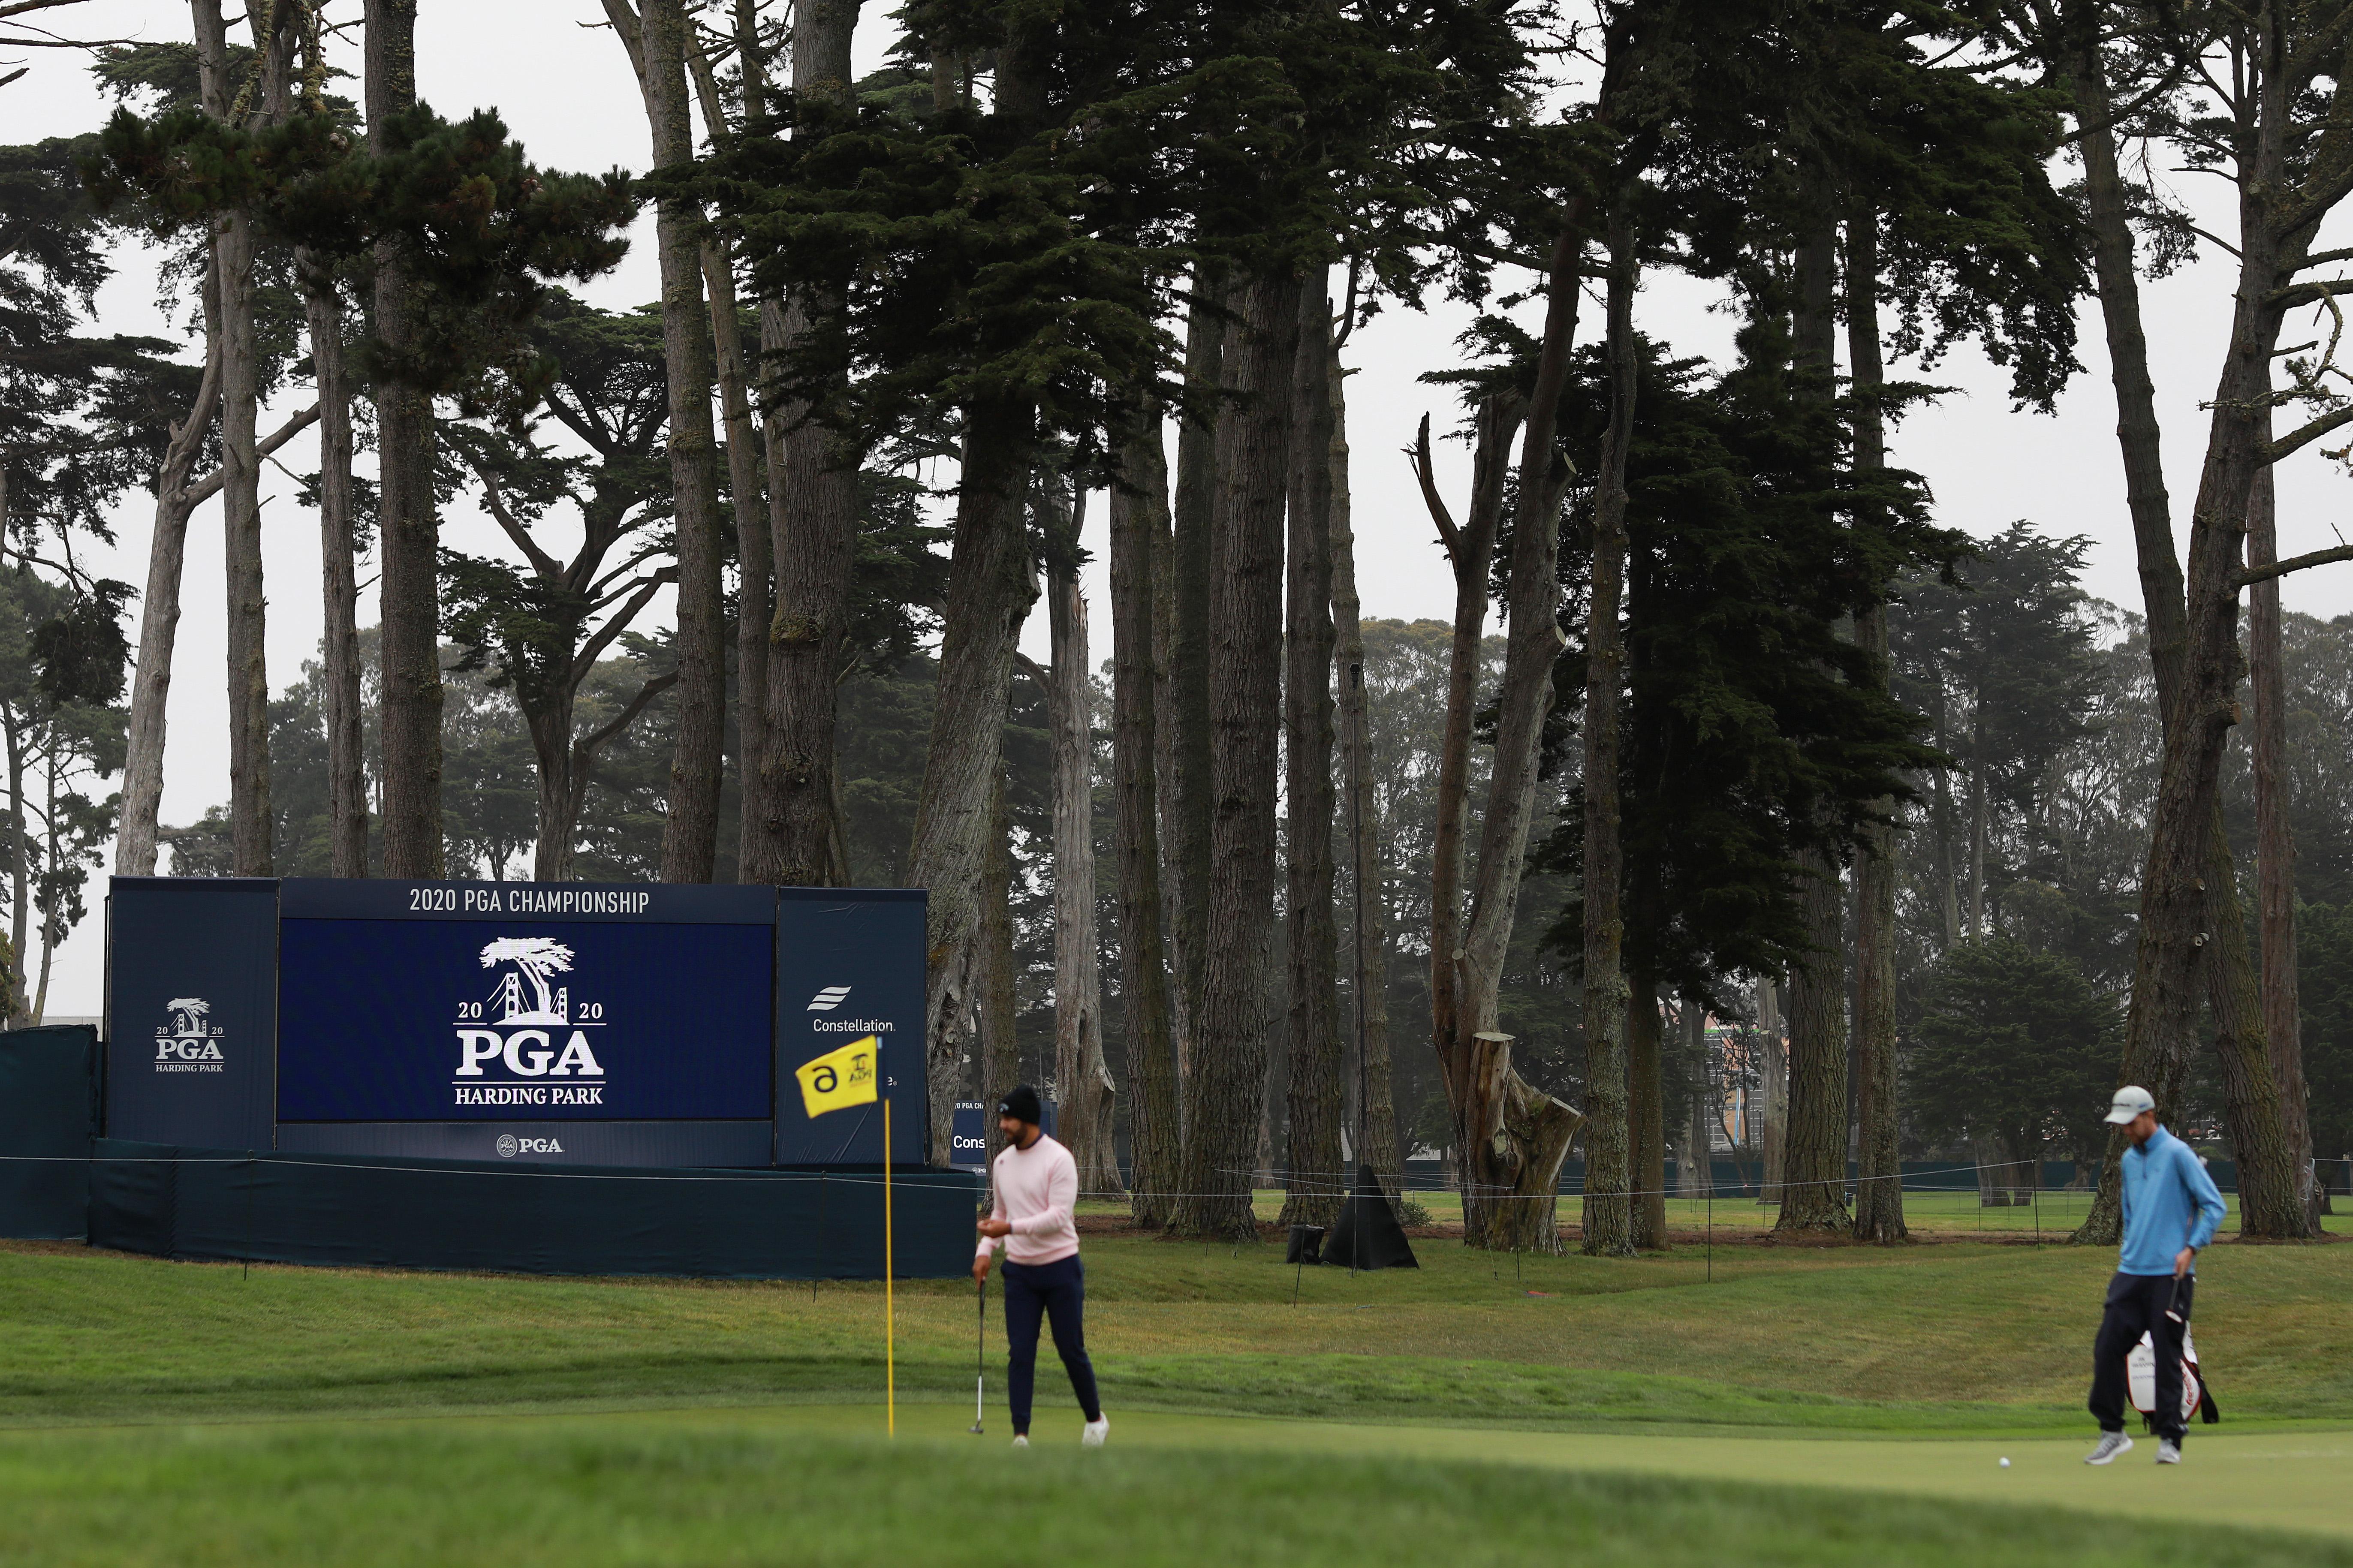 PGA Championship - Preview Day 2